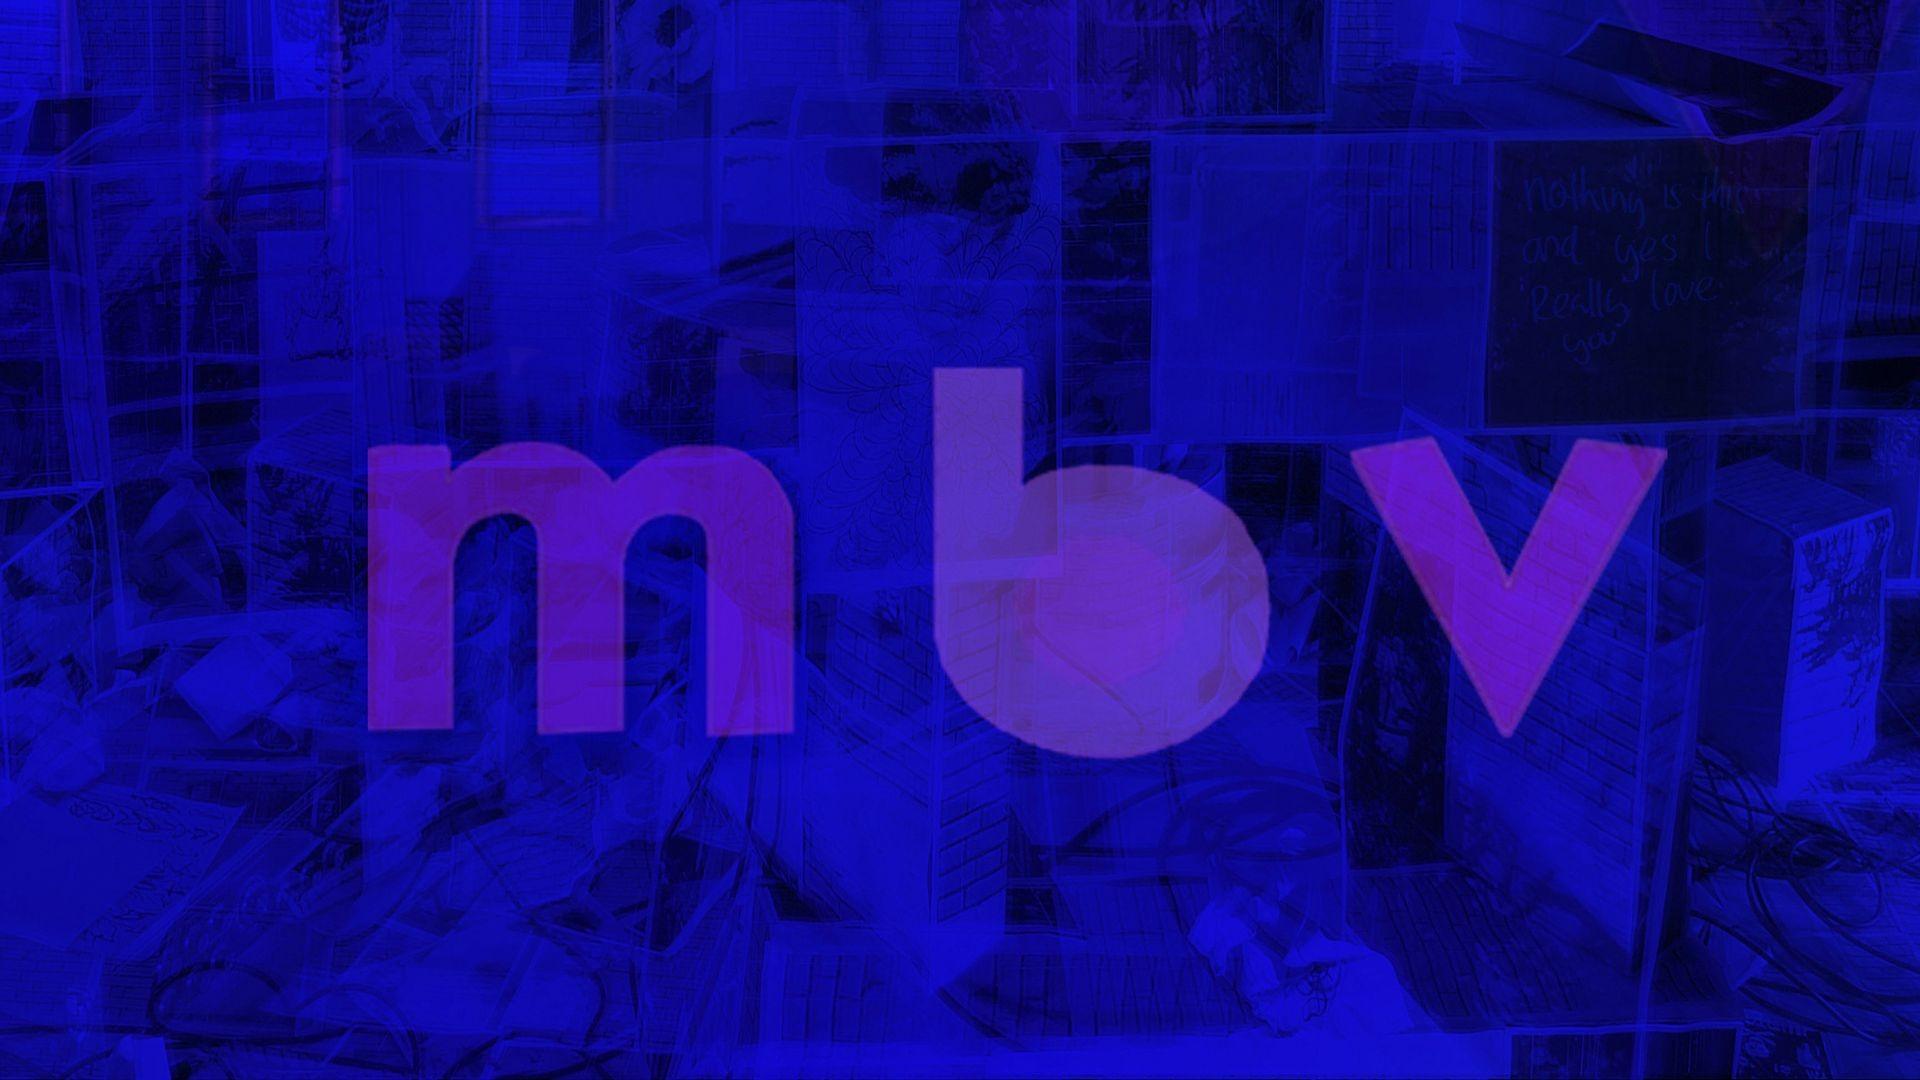 Amazing Wallpaper Music Violet - space-purple-violet-text-music-blue-cover-art-album-covers-my-bloody-valentine-light-graphics-1920x1080-px-computer-wallpaper-font-phenomenon-electric-blue-cobalt-blue-843635  HD_109259.jpg